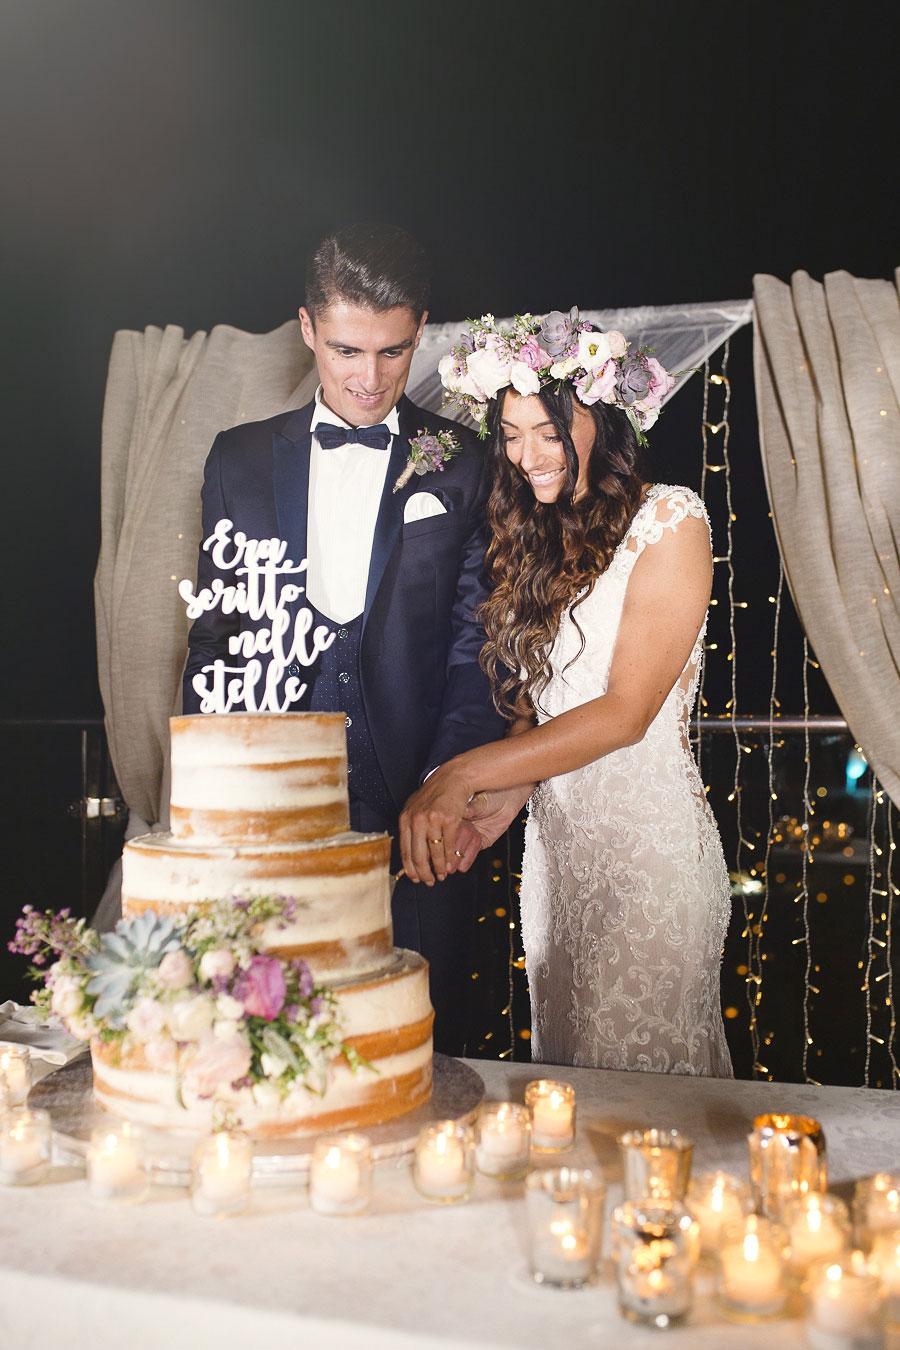 Wedding-Nicholad-and-Federica-Giuseppe-Giovannelli-182